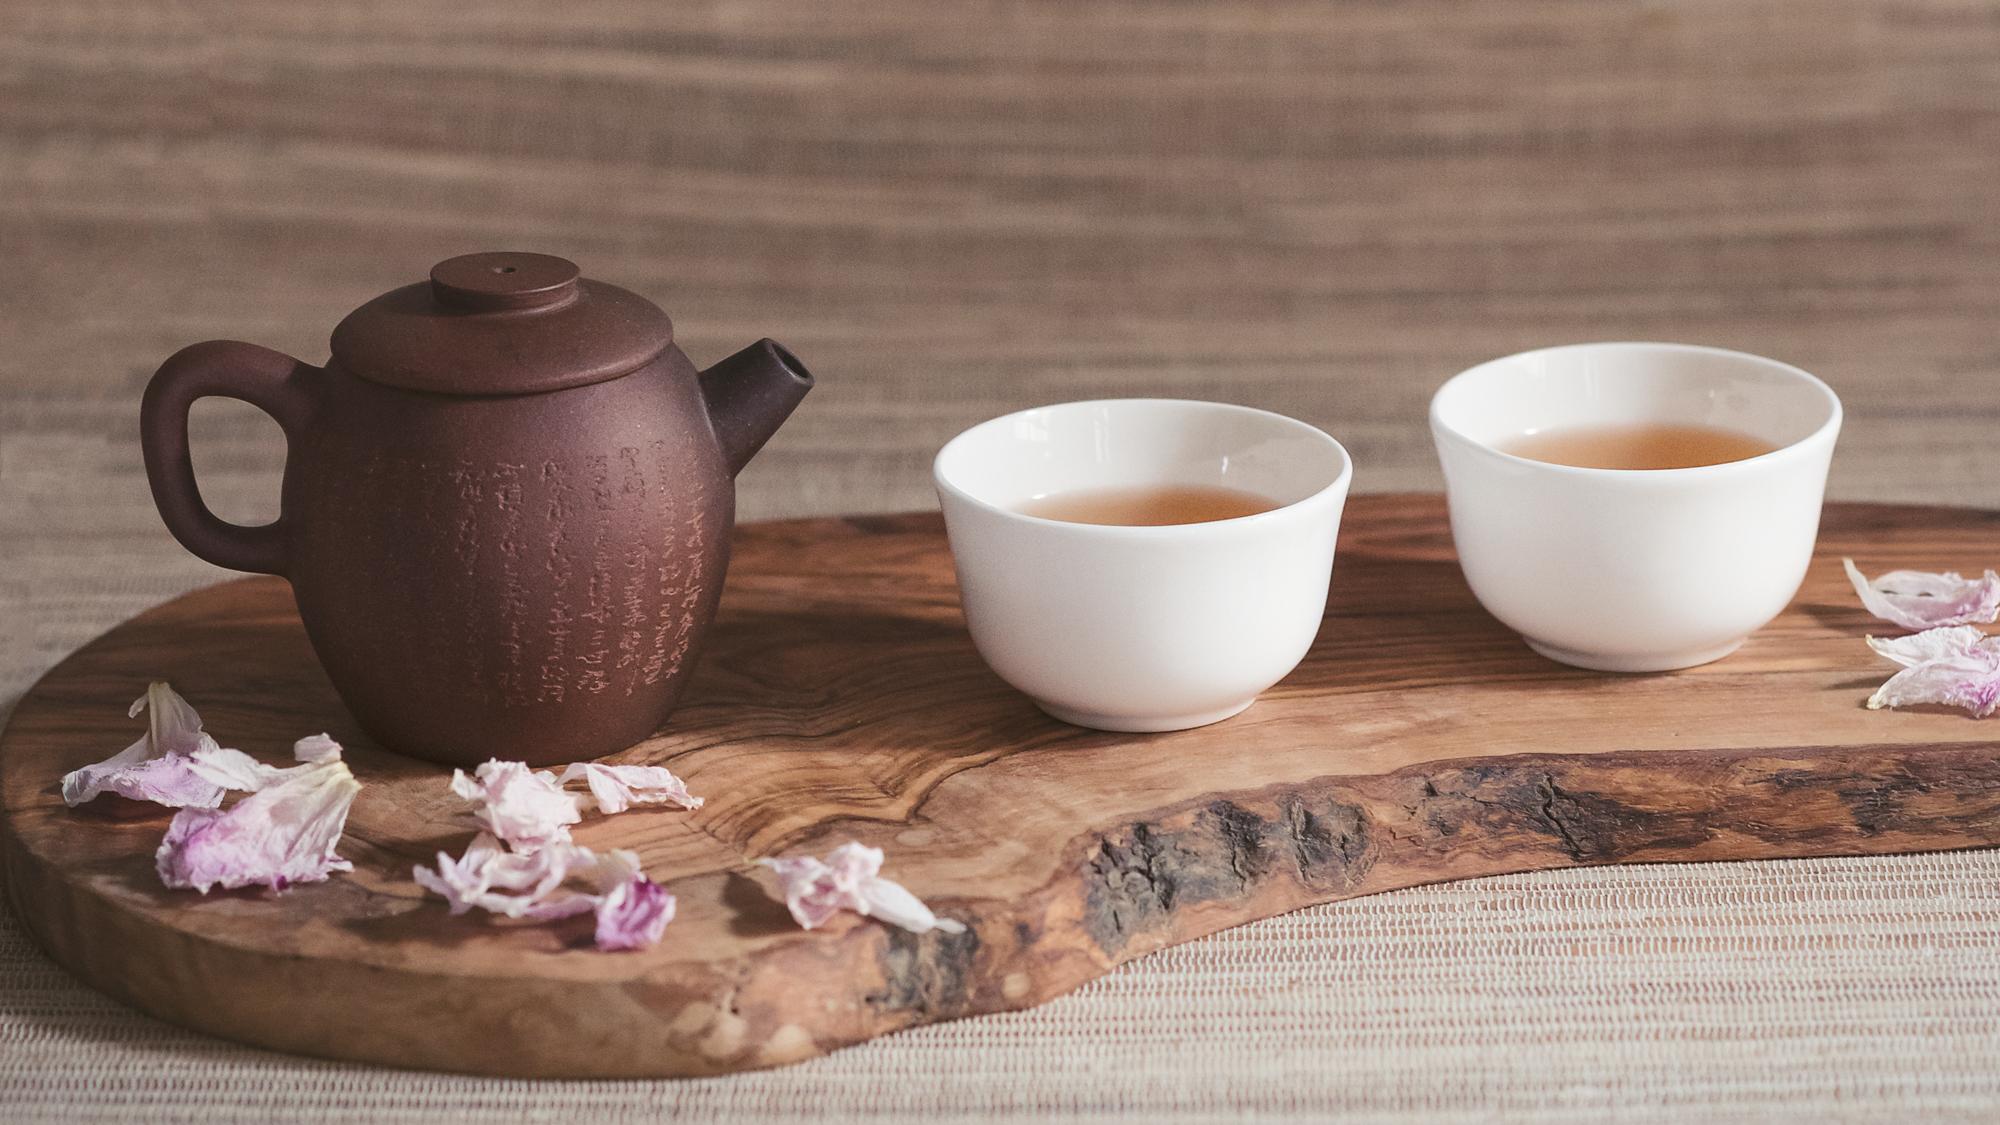 Tea - cha dao & chinese tea ceremony